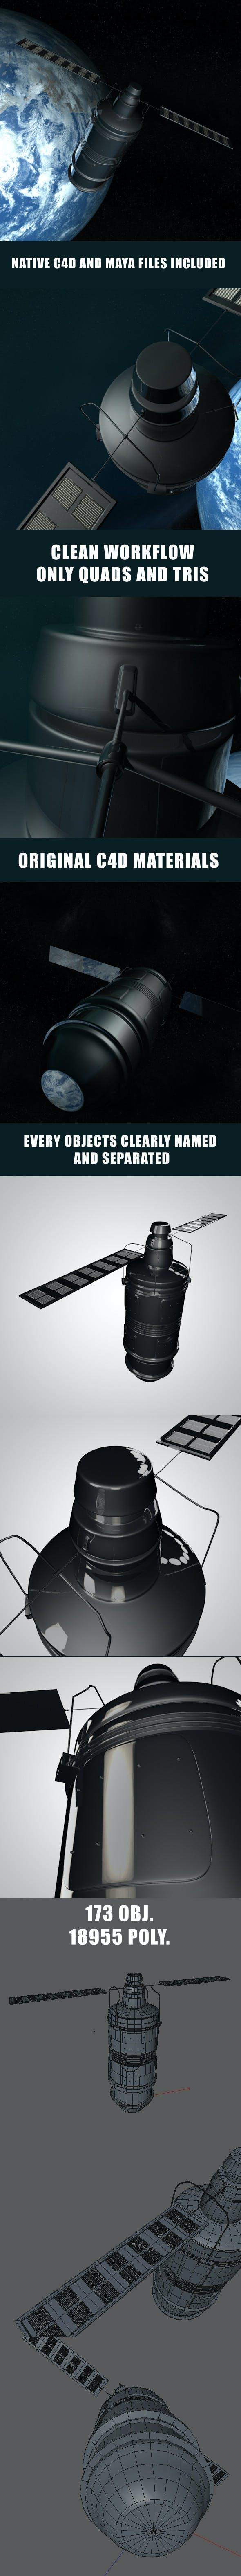 Space Satellite - 3DOcean Item for Sale